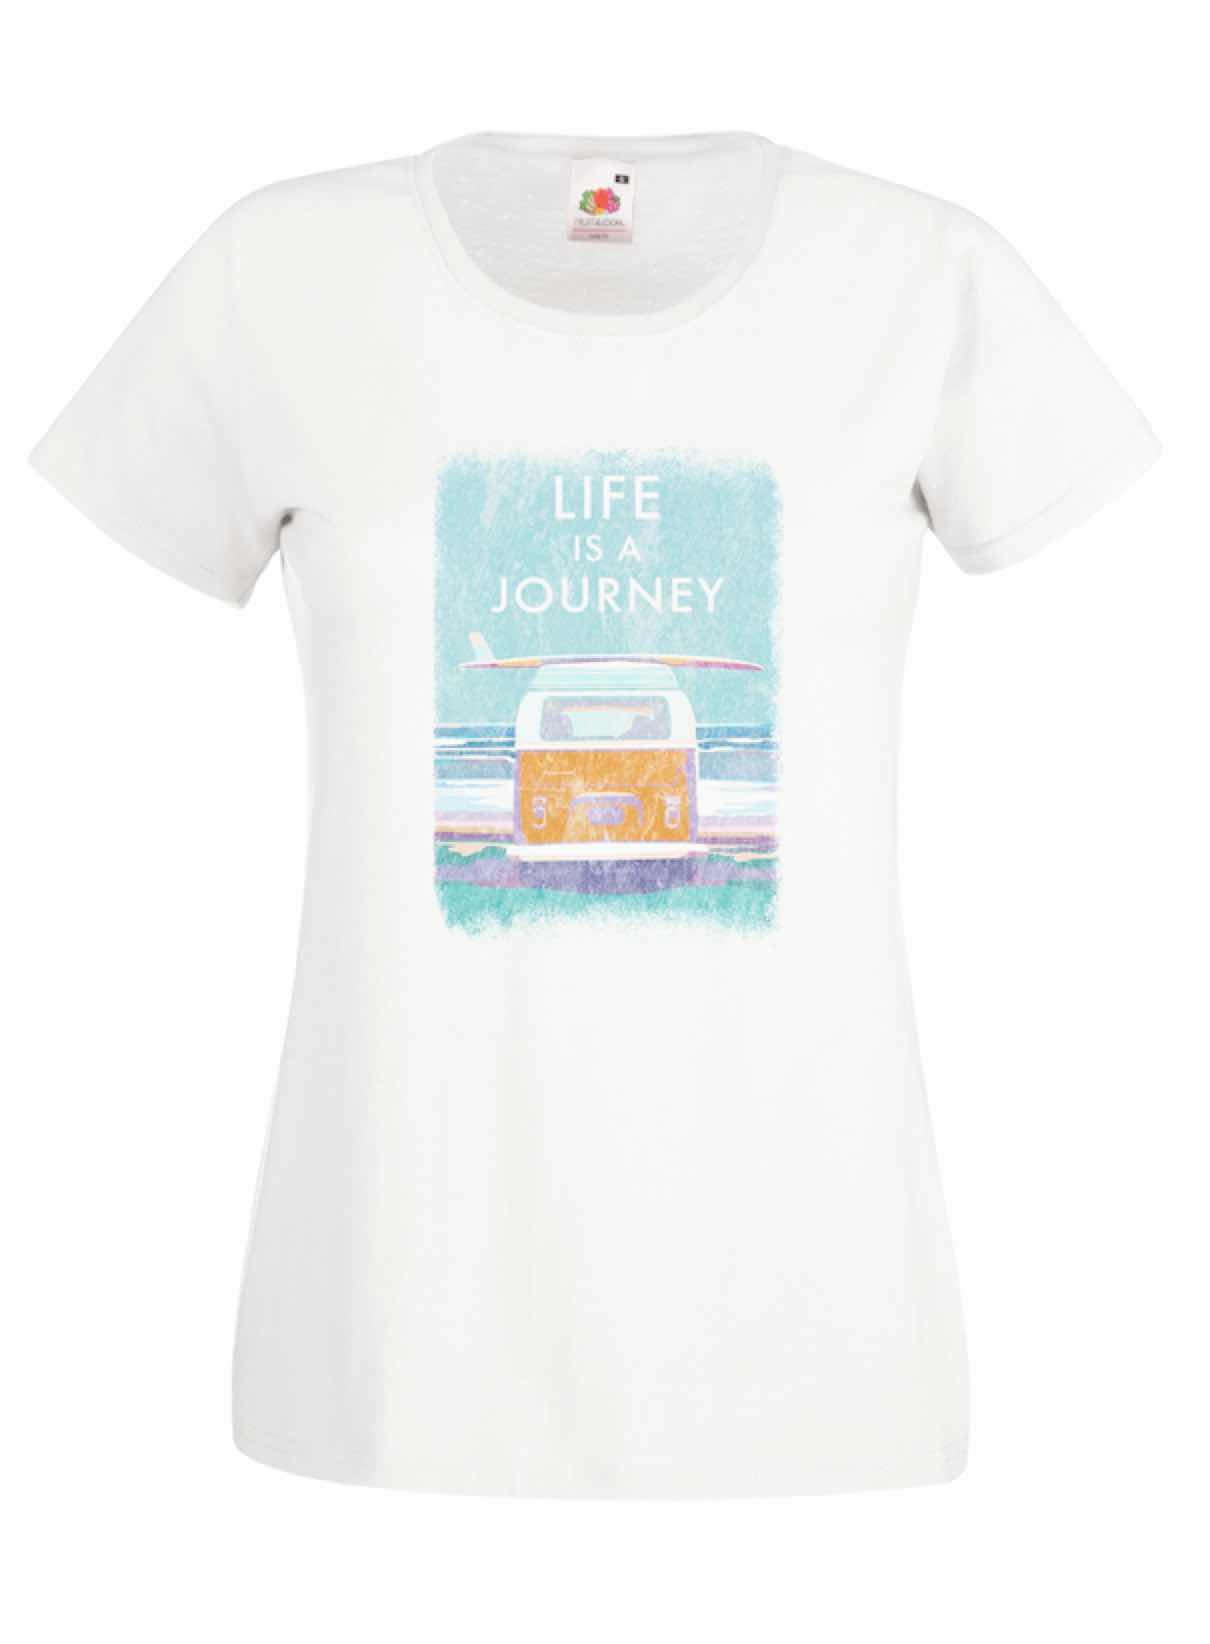 Life Is A Journey design for t-shirt, hoodie & sweatshirt